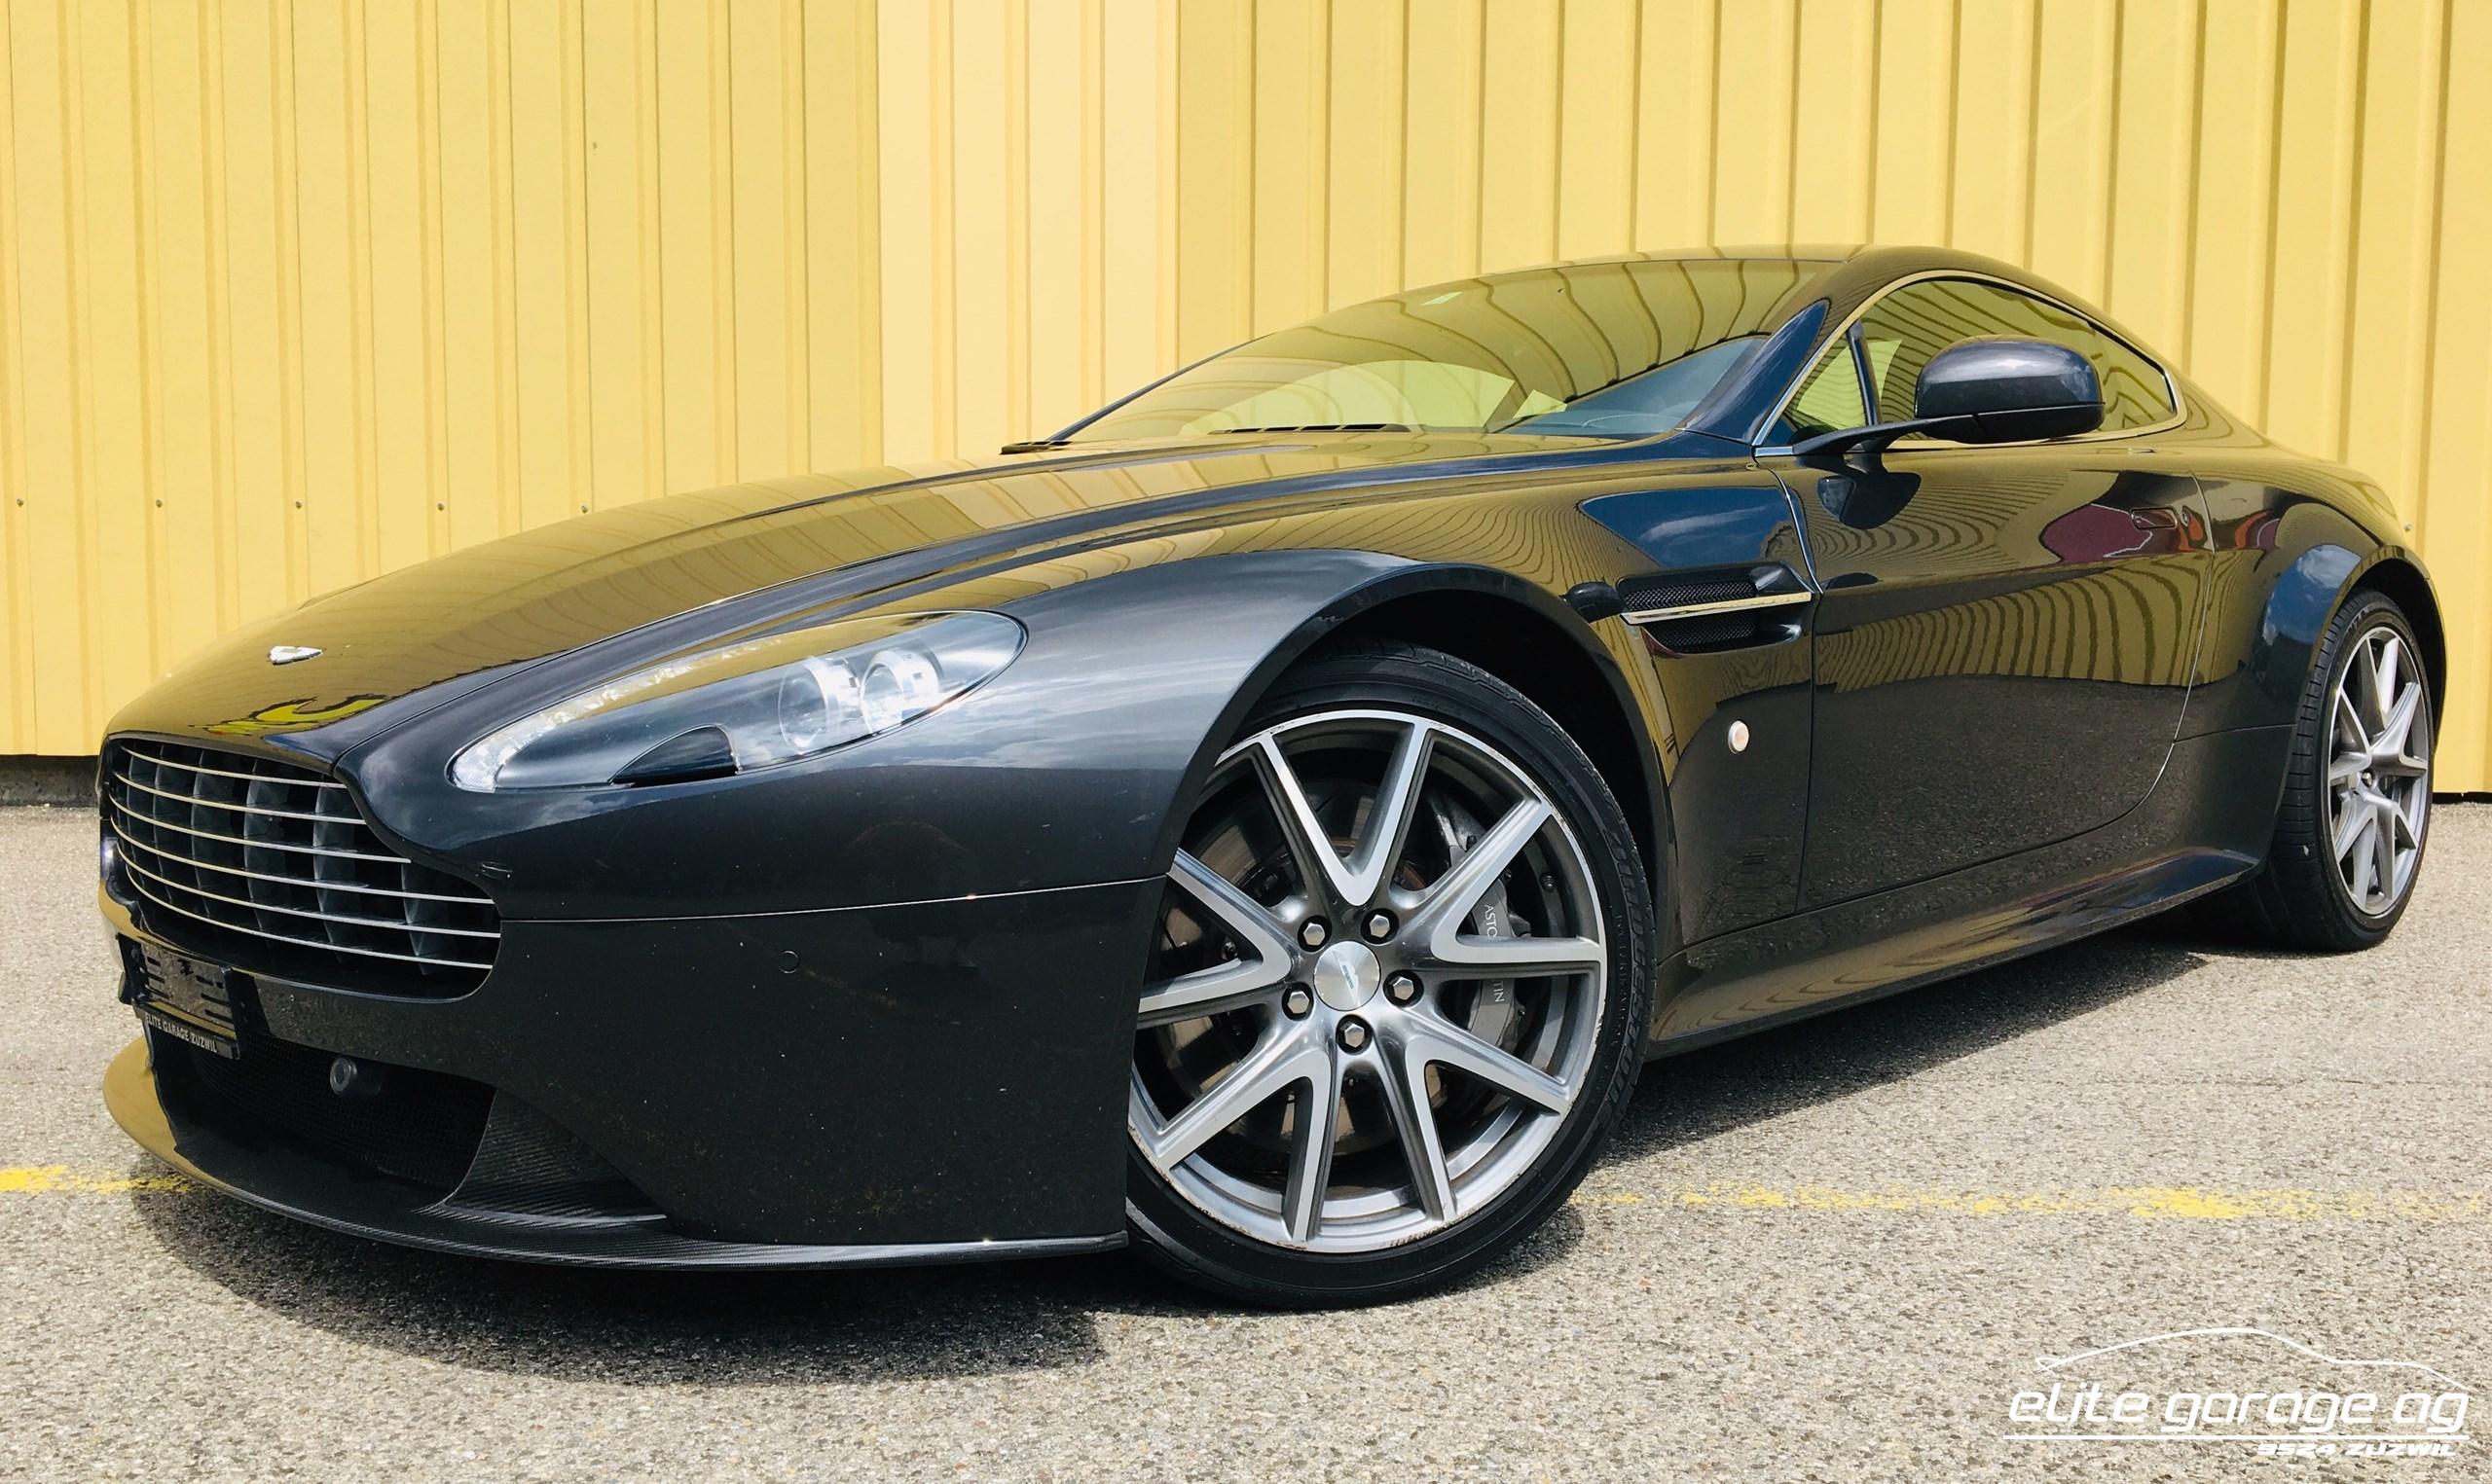 Gebraucht Sportwagen Aston Martin V8 V12 Vantage S V8 Vantage 4 7 S Sportshift 48500 Km Für 62800 Chf Kaufen Auf Carforyou Ch